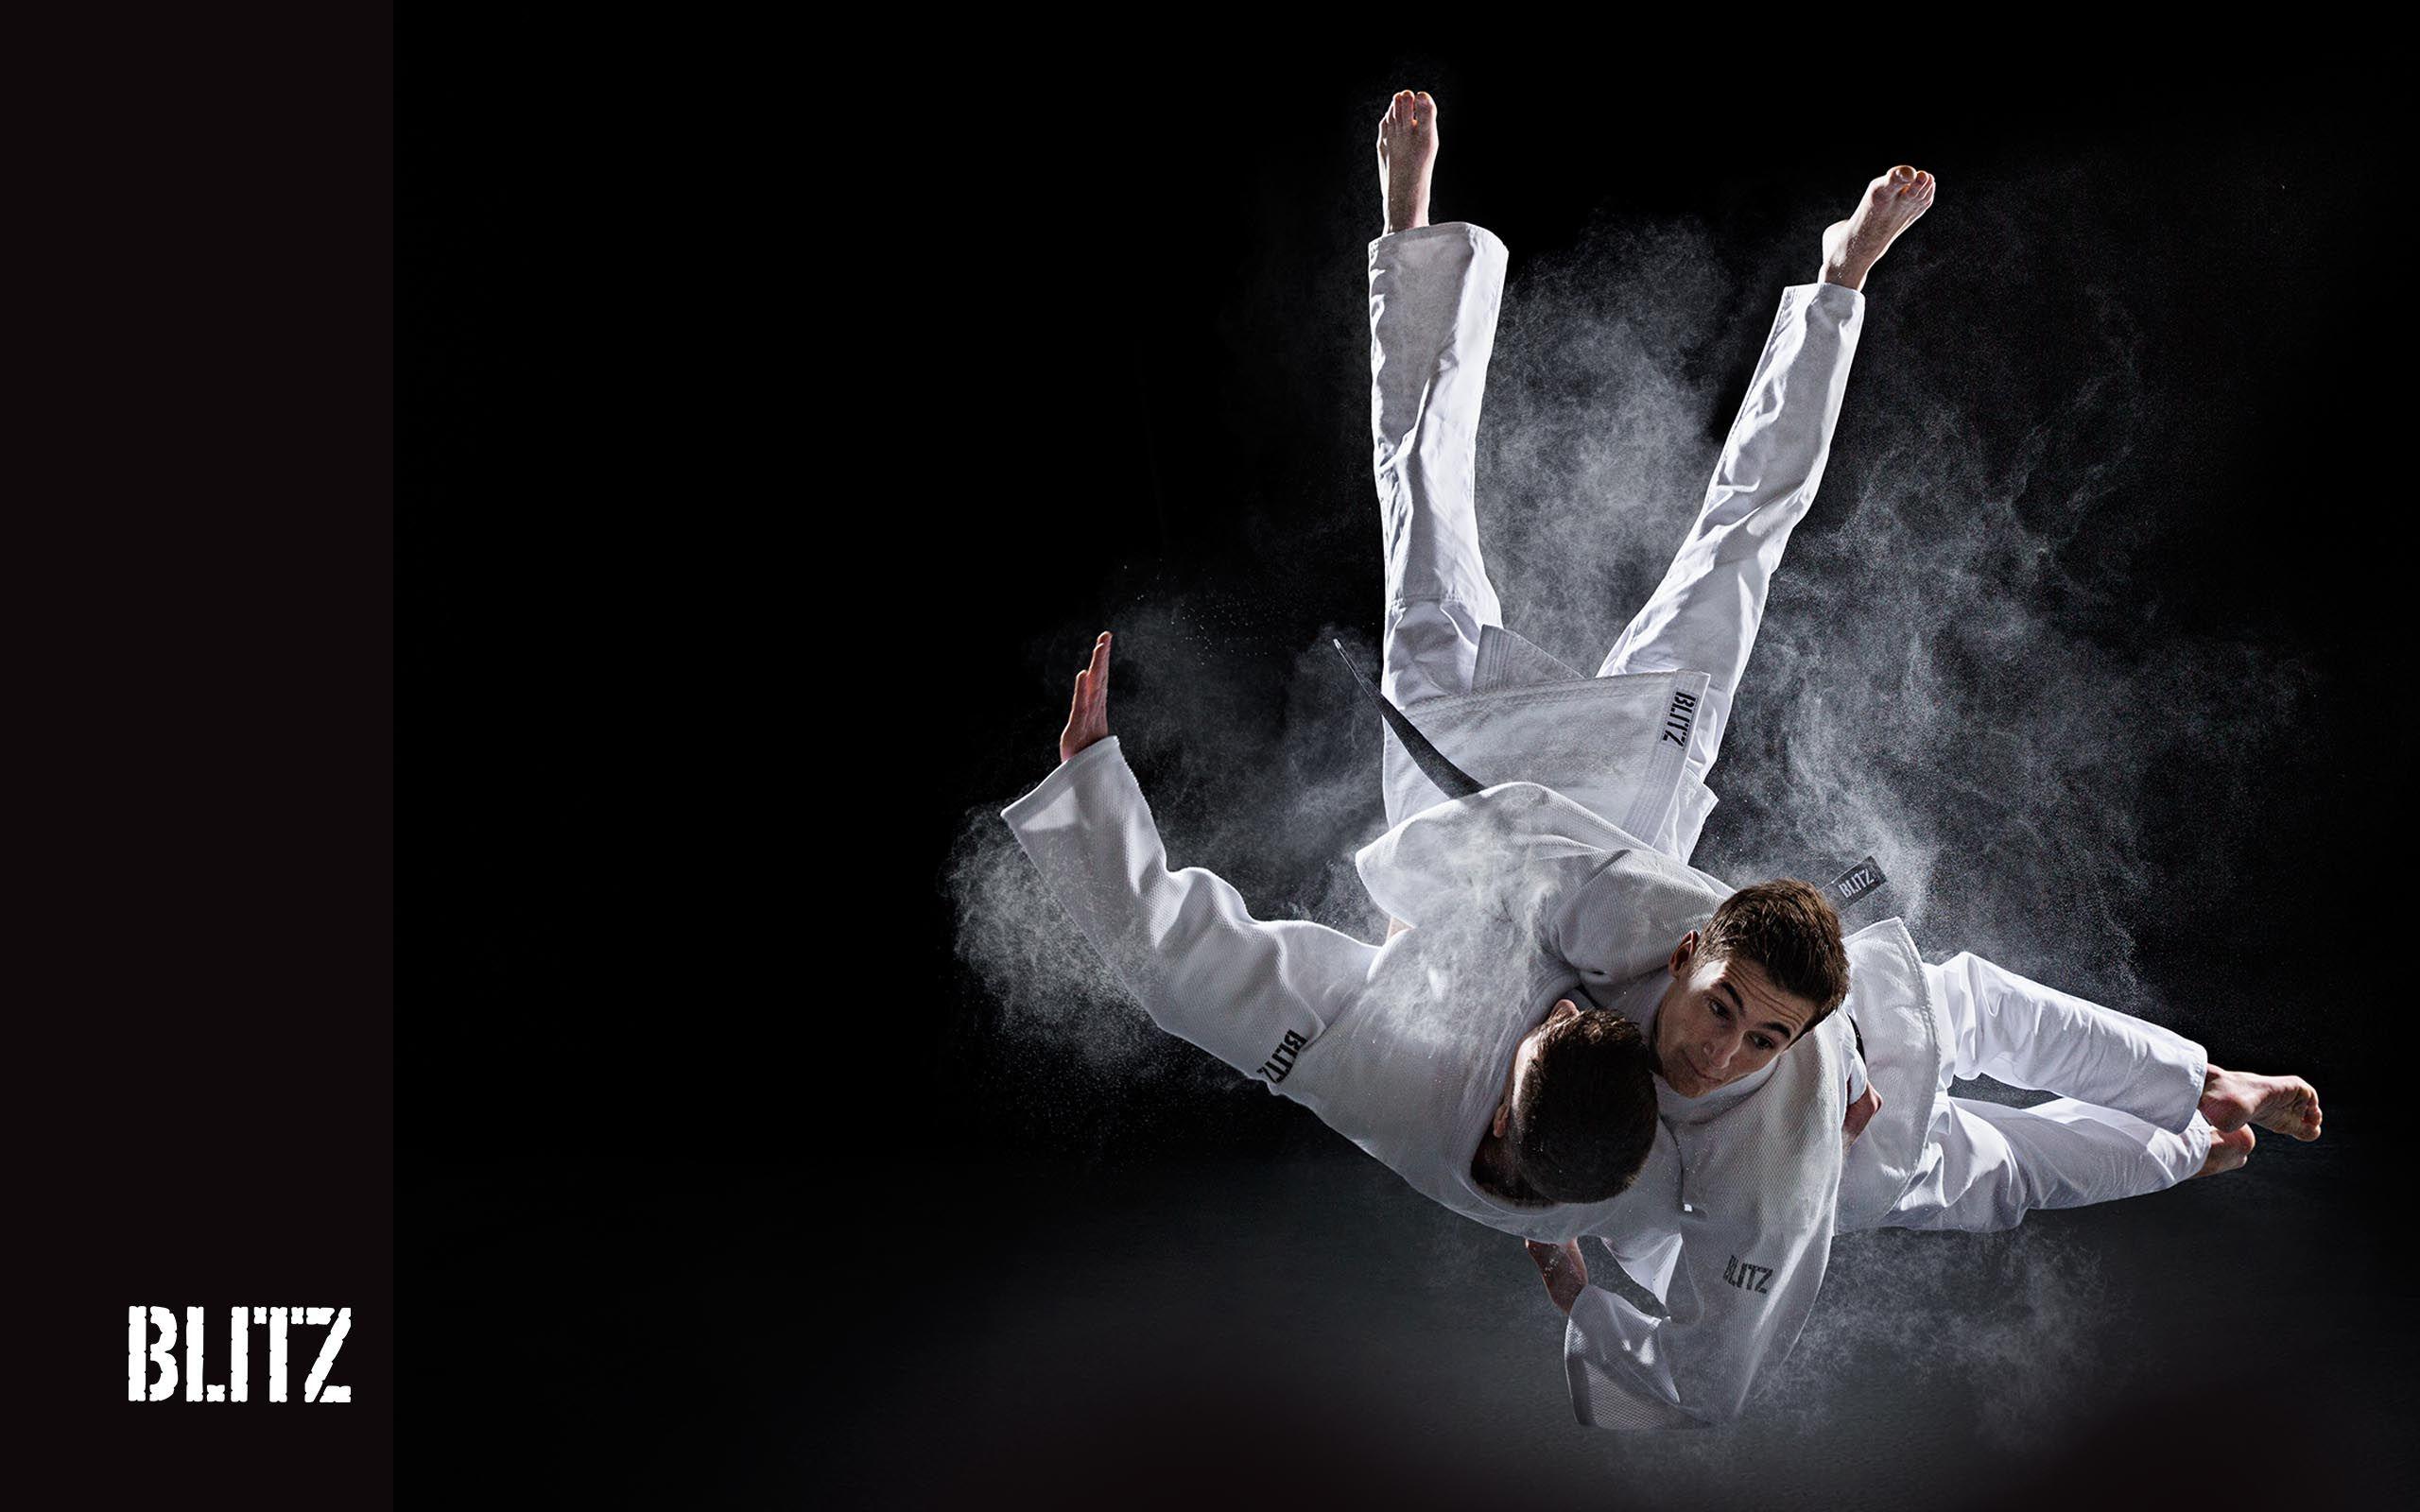 Blitz Judo Wallpaper 2560 X 1600 Judo Jiu Jitsu Bjj Training